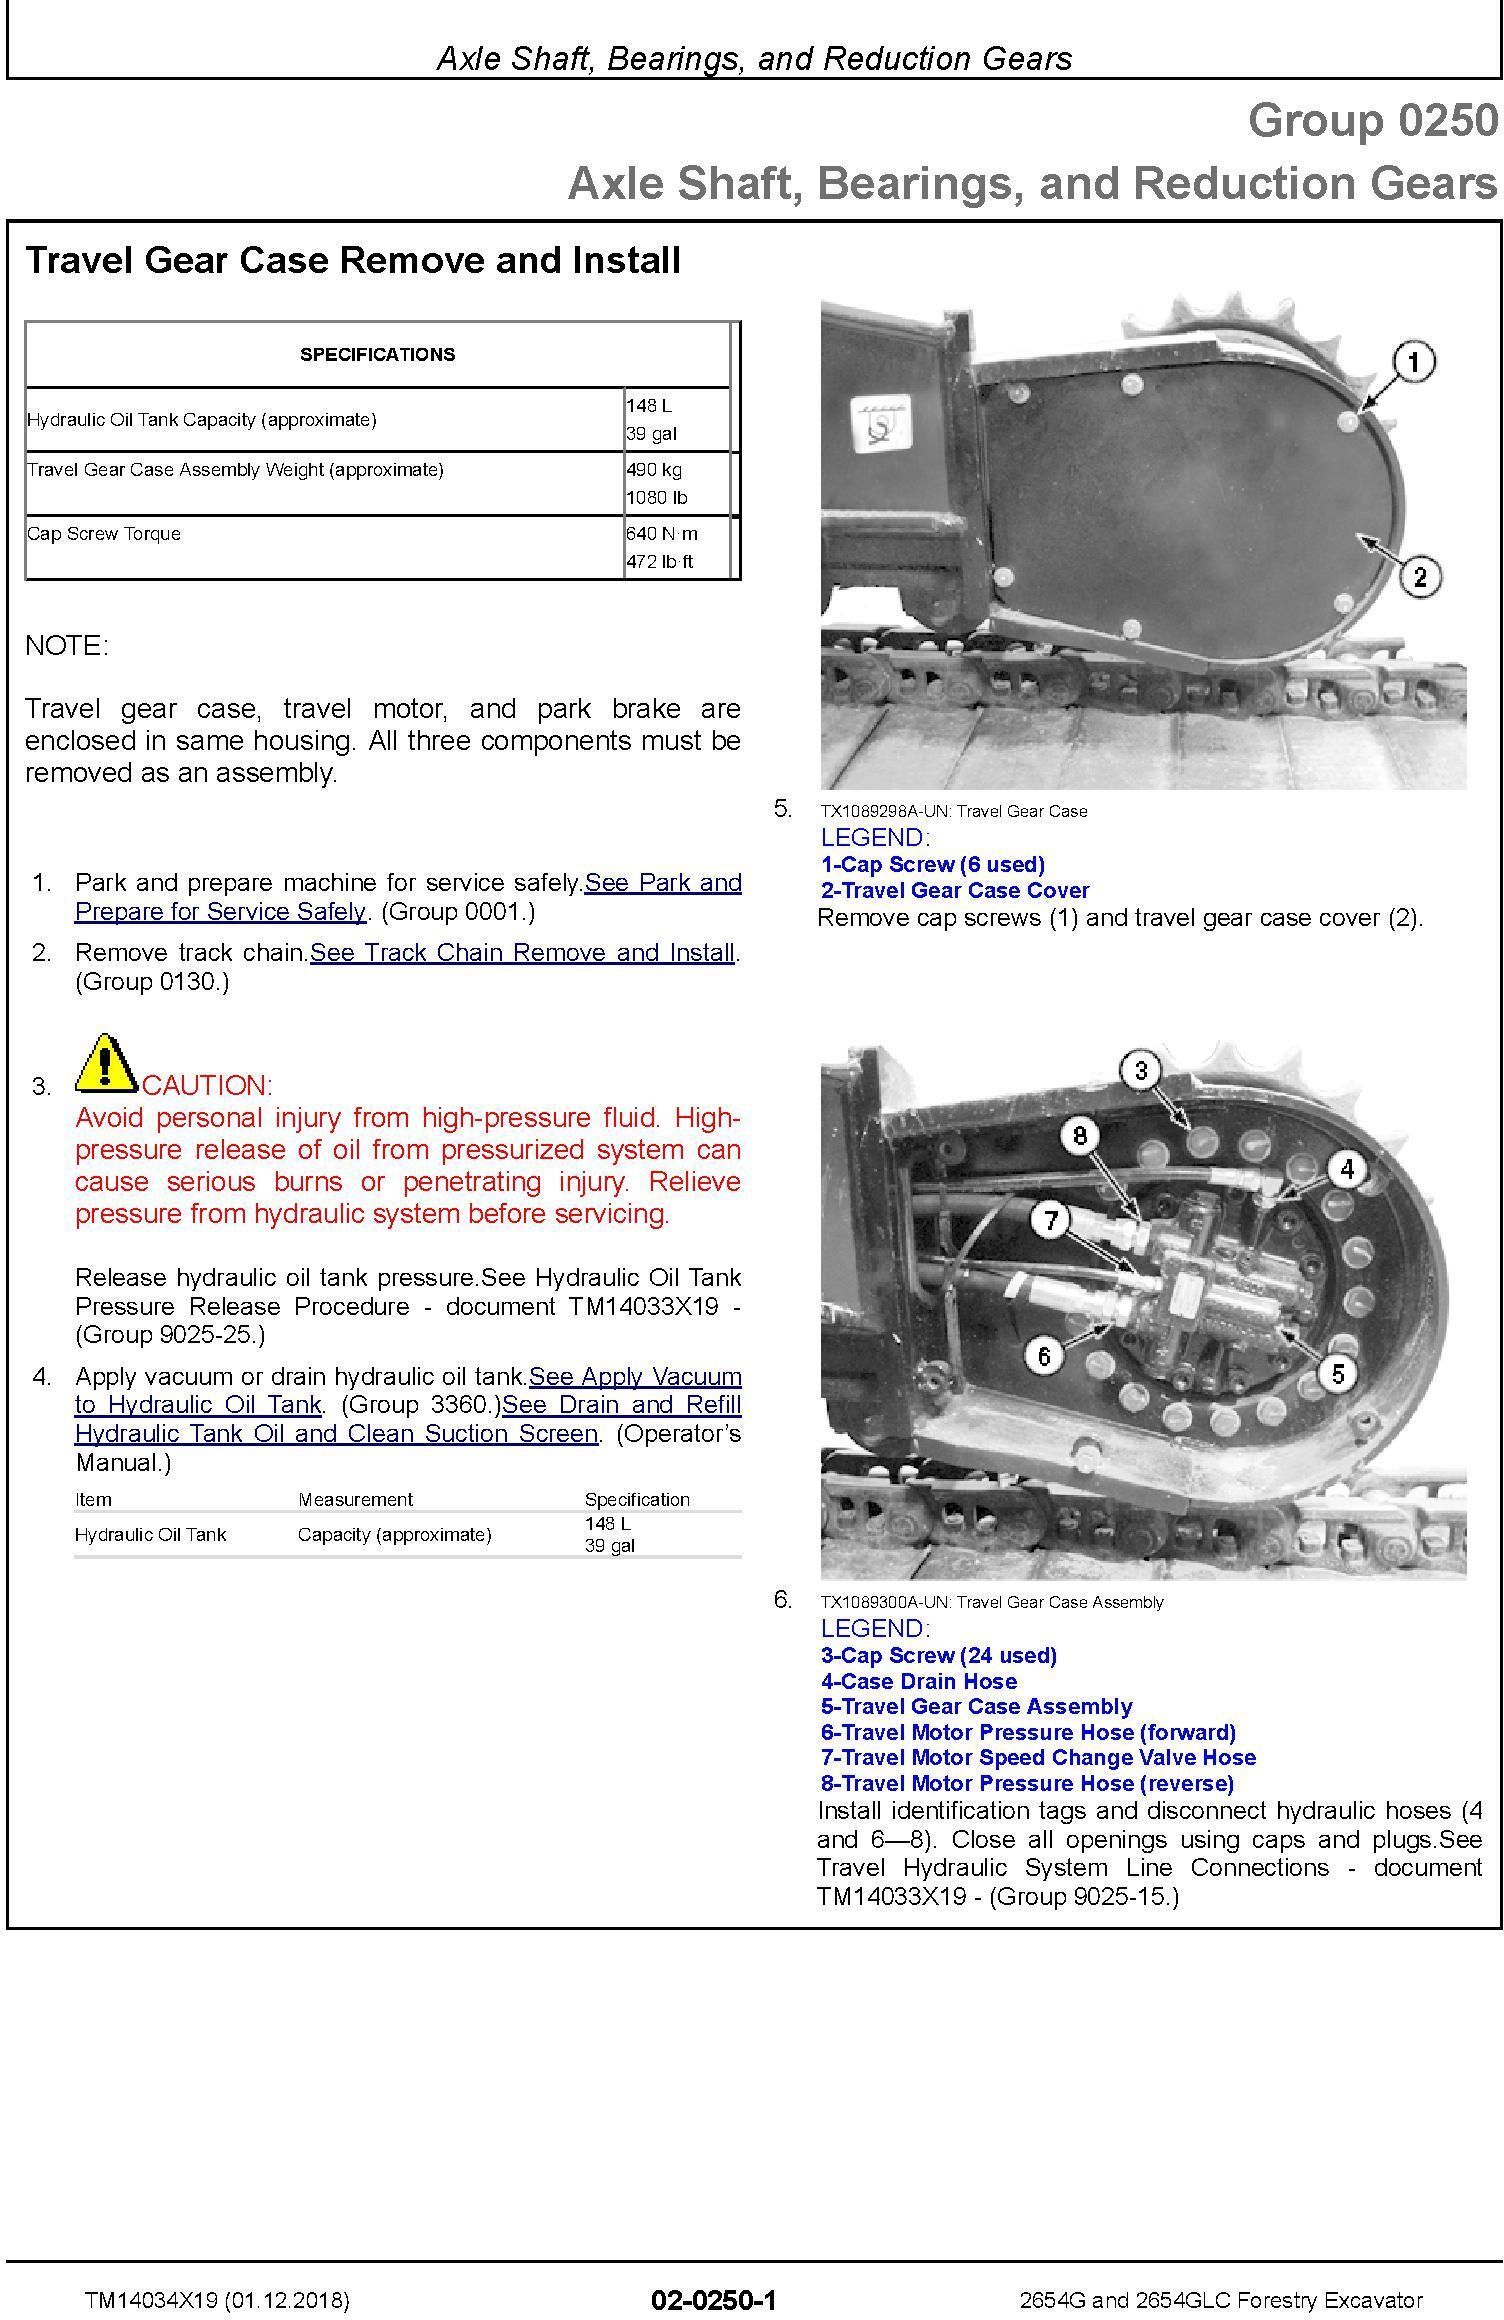 John Deere 2654G, 2654GLC (SN. F260001-) Forestry Excavator Repair Technical Manual (TM14034X19) - 2